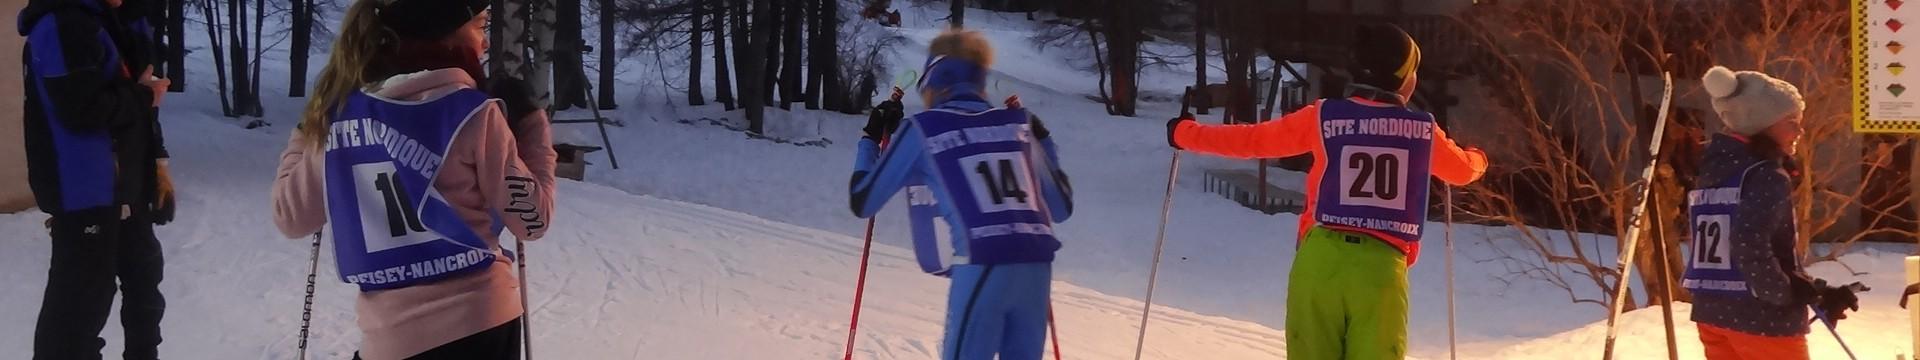 ski-and-run-01-9007